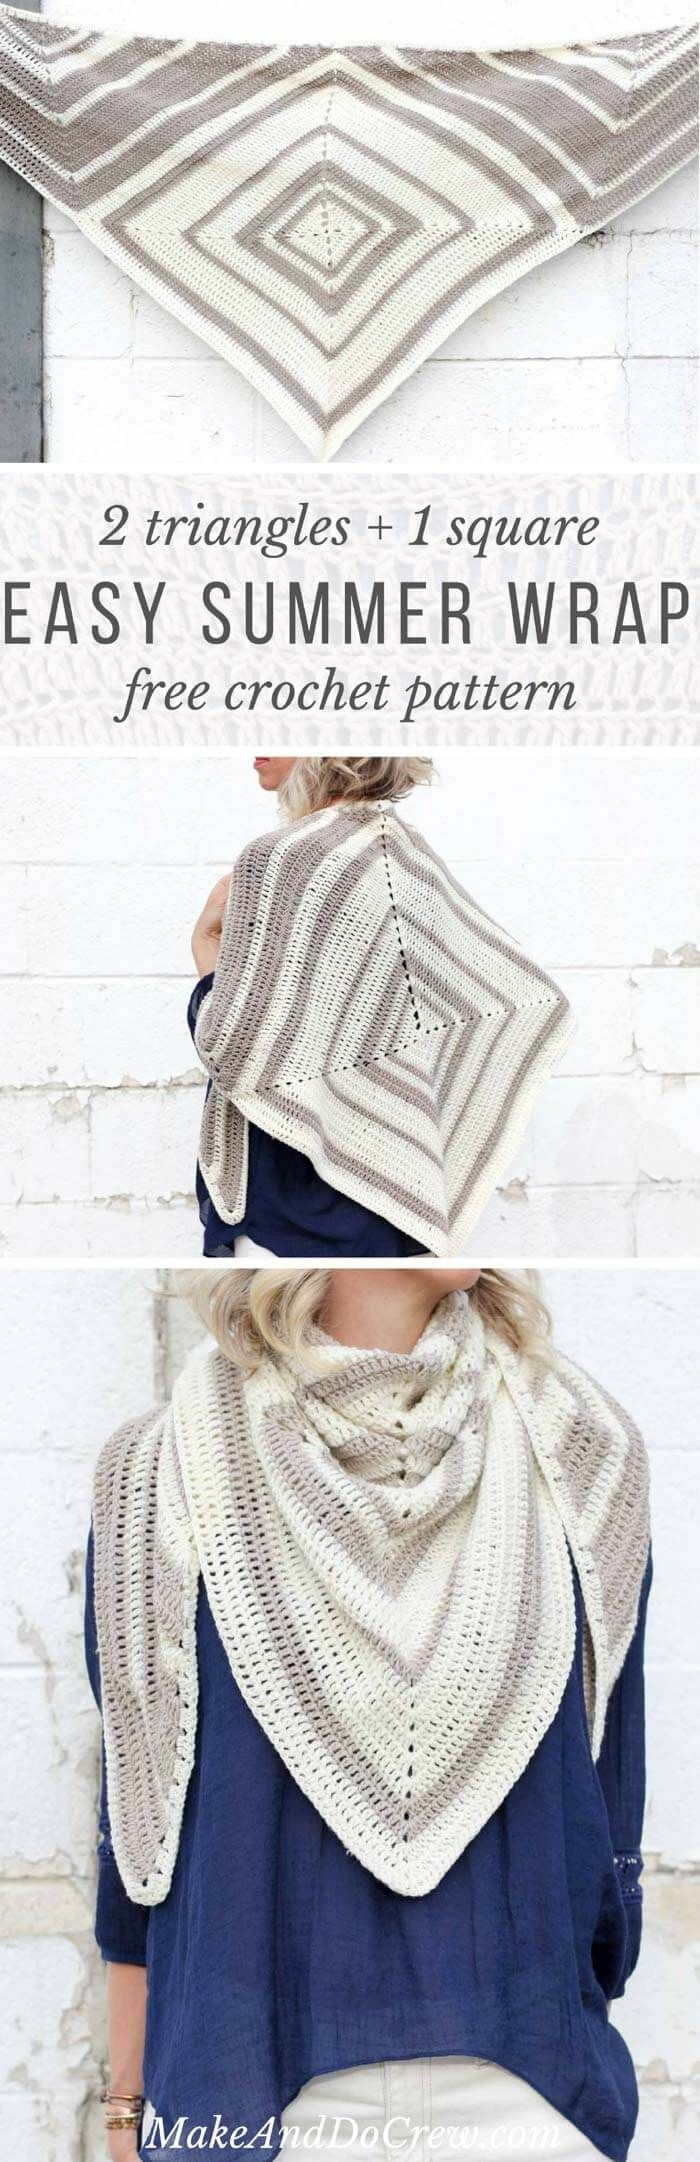 Mejores 248 imágenes de Crochet 7b Chales, bufandas en Pinterest ...